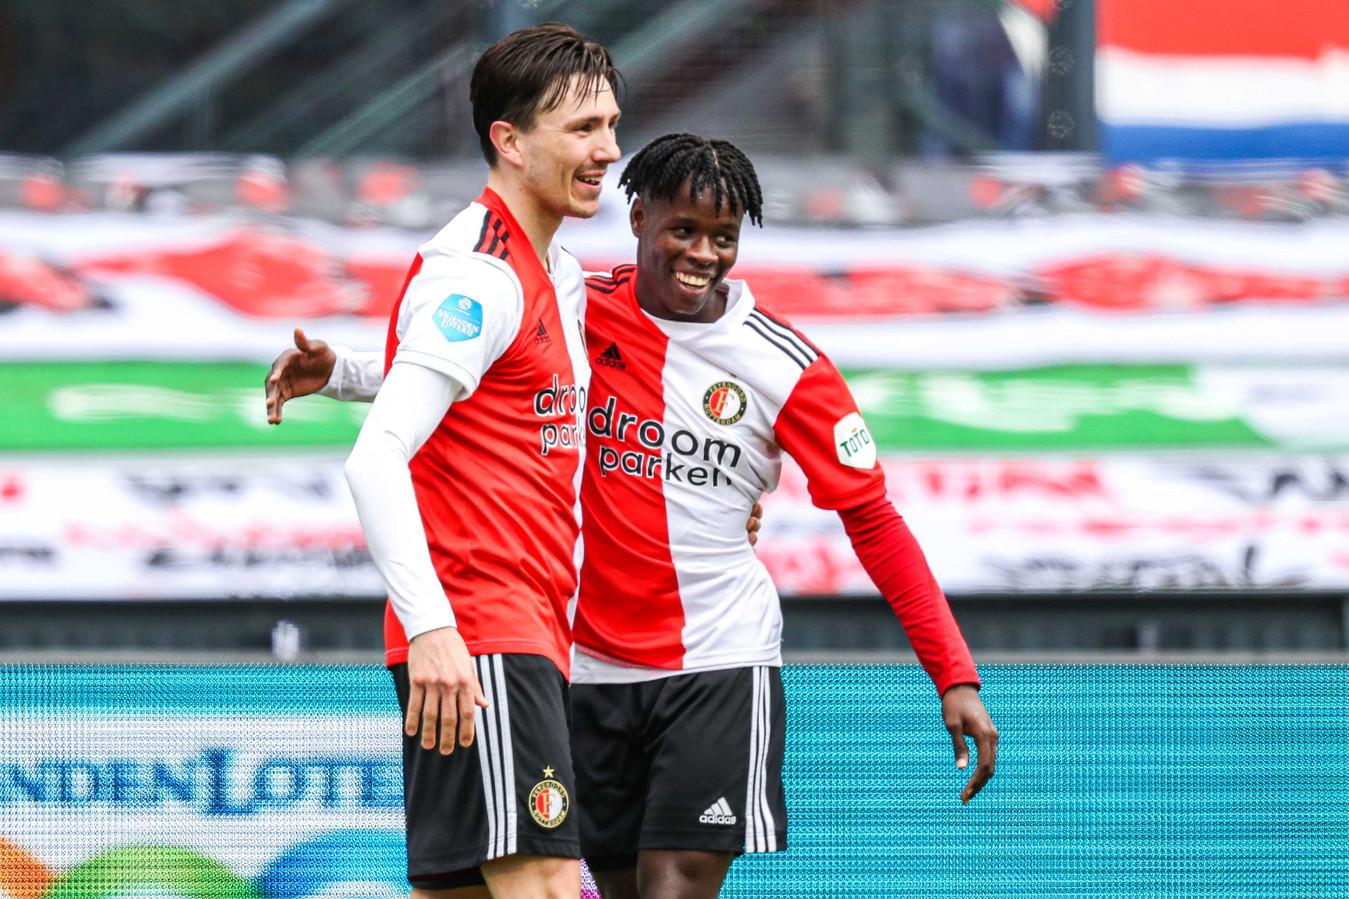 Aliou Balde gaf de assist bij de 2-0 van Steven Berghuis.